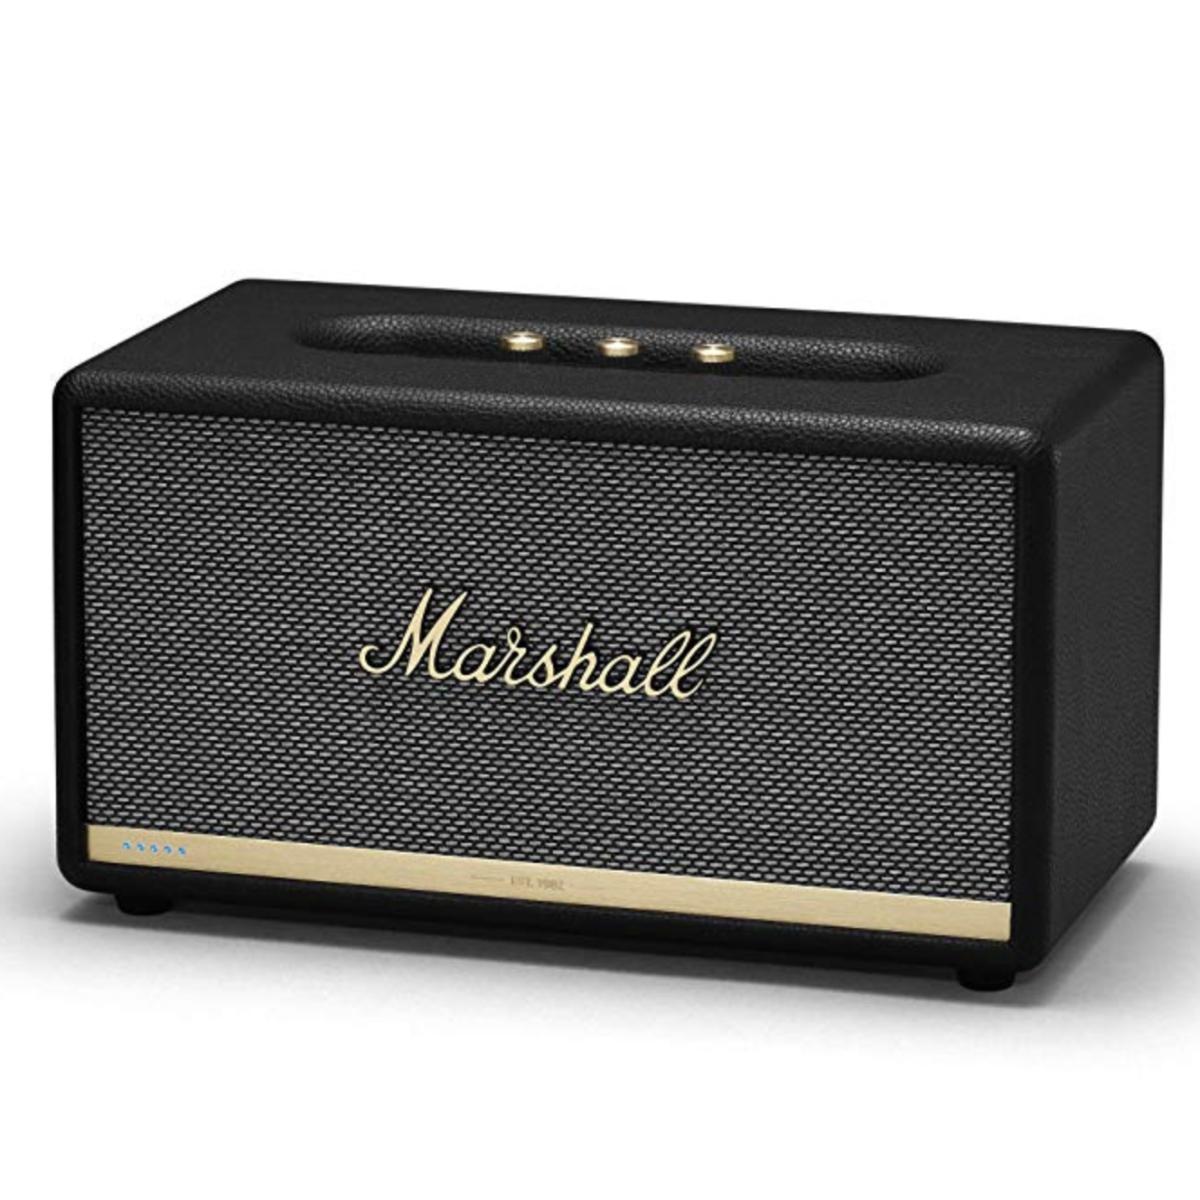 These rocking Marshall Bluetooth speaker deals will unleash